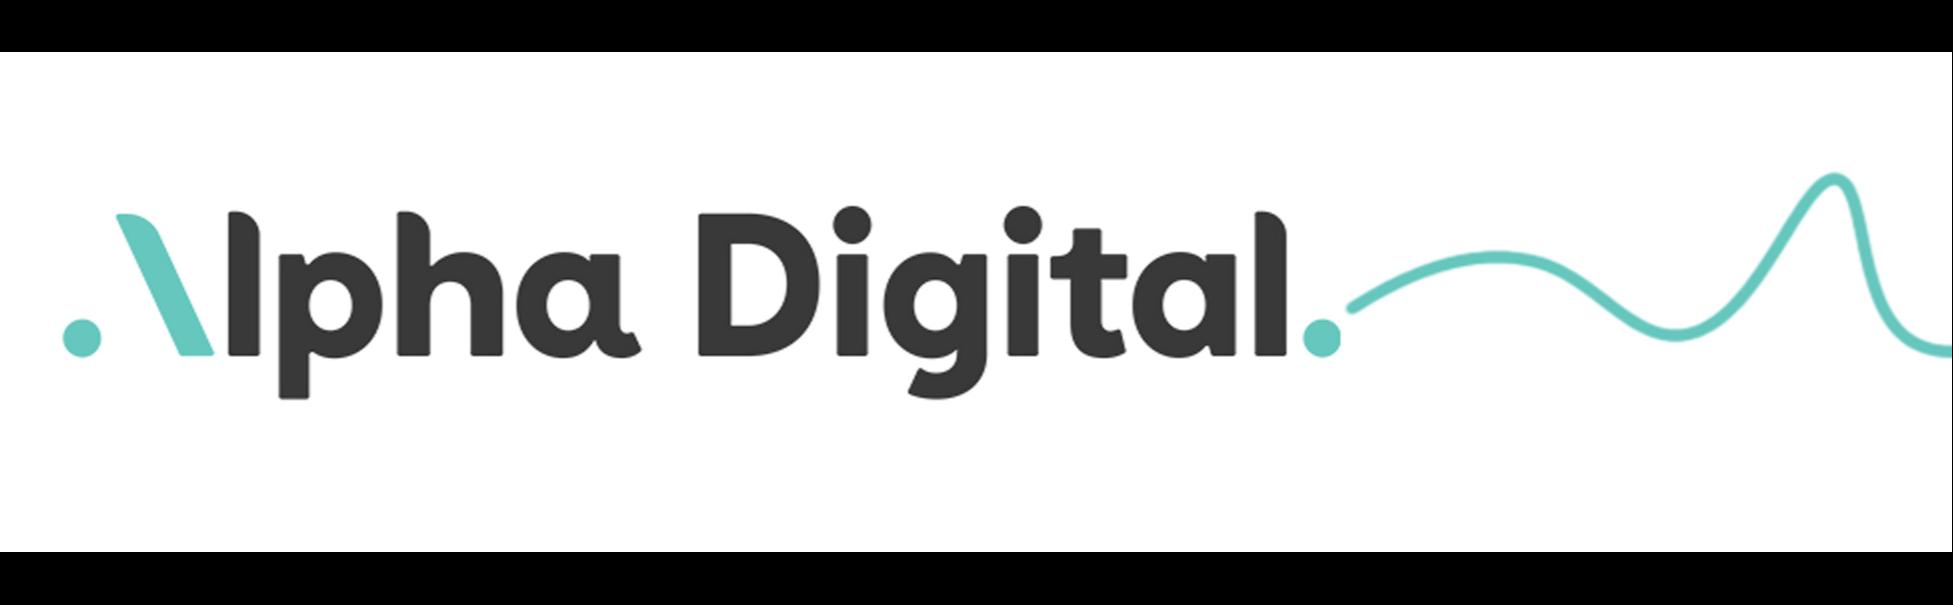 Digital Marketing Graduate profile banner profile banner